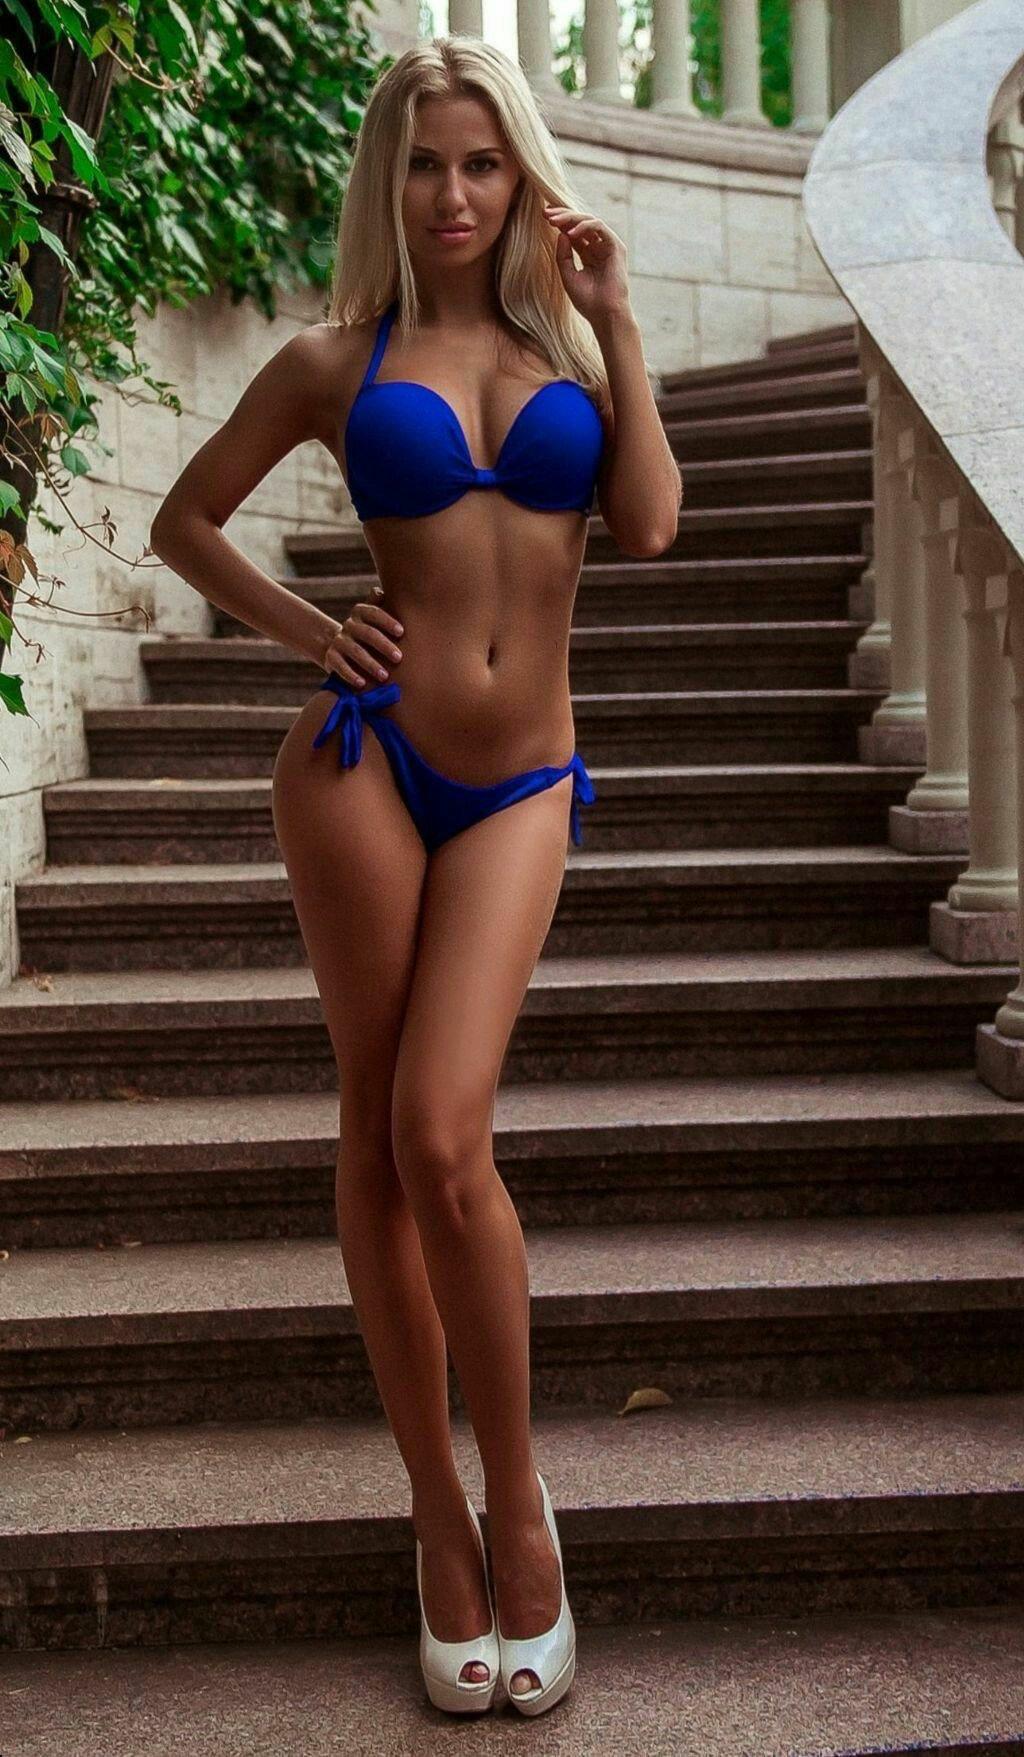 Adults only bikinis